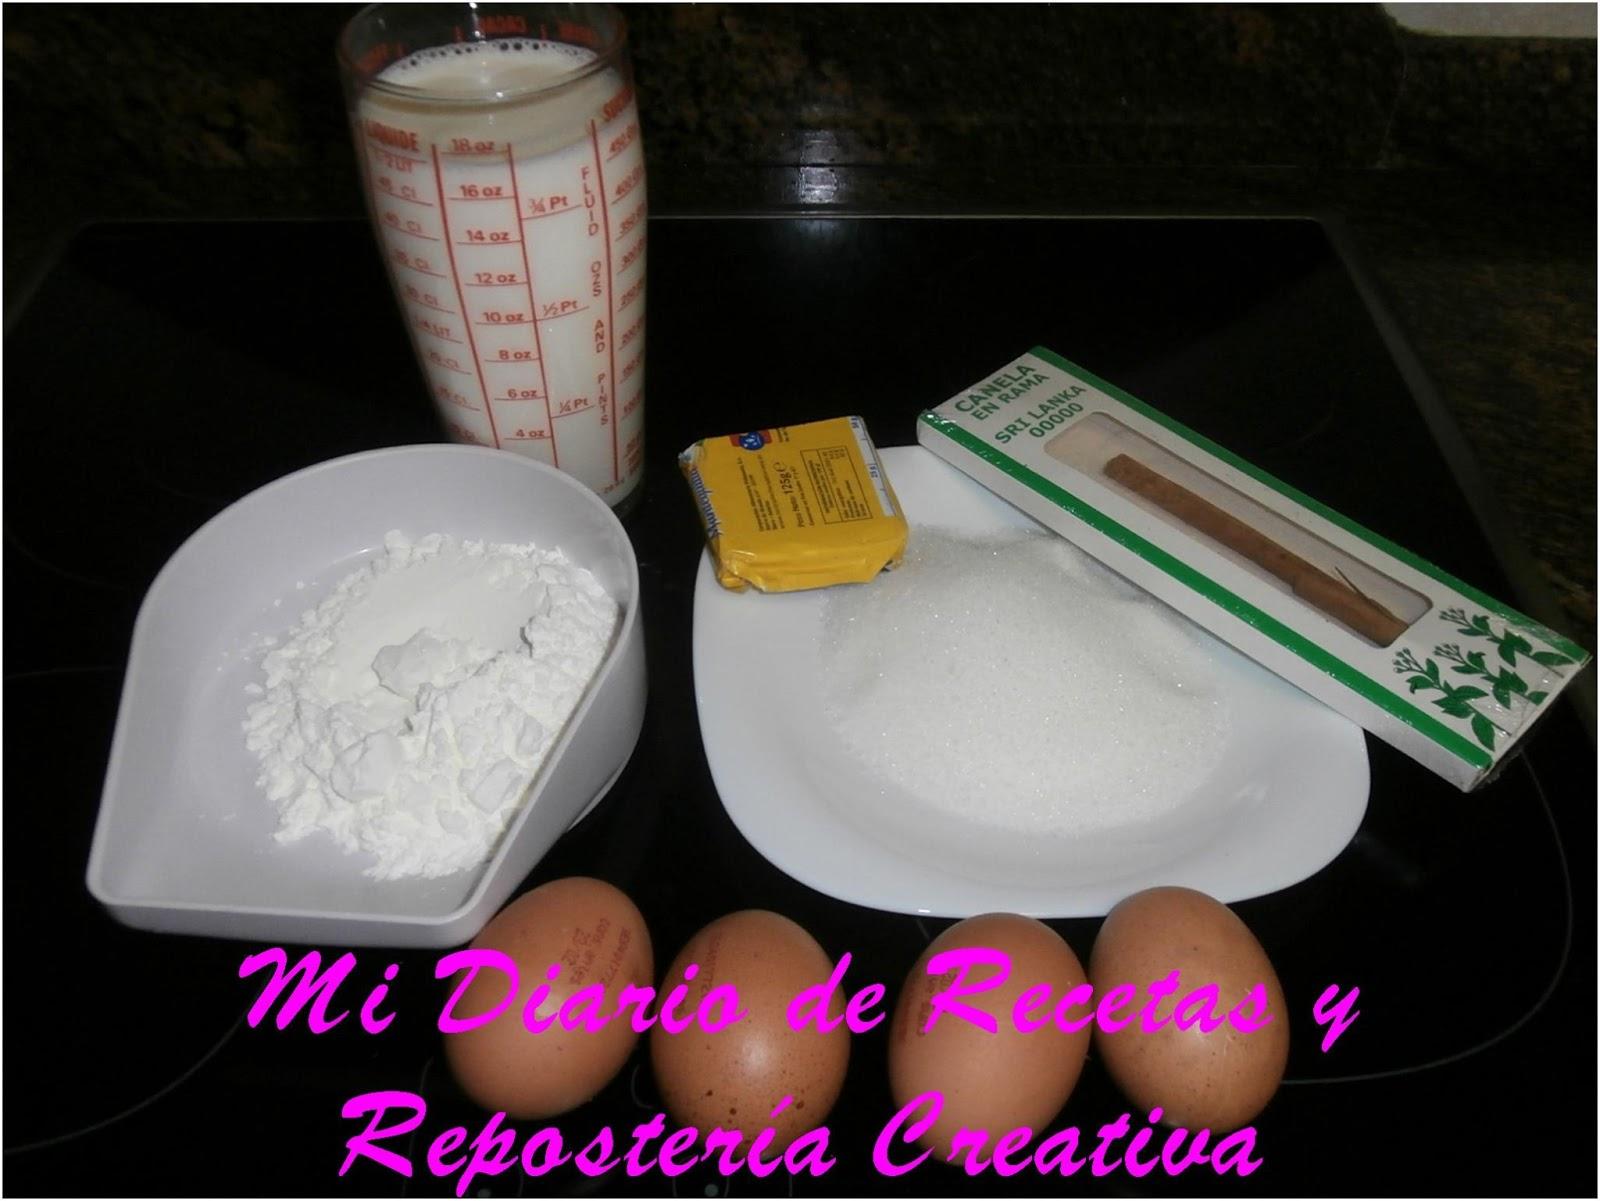 Mi diario de recetas y reposteria creativa hojaldre - Ingredientes reposteria creativa ...